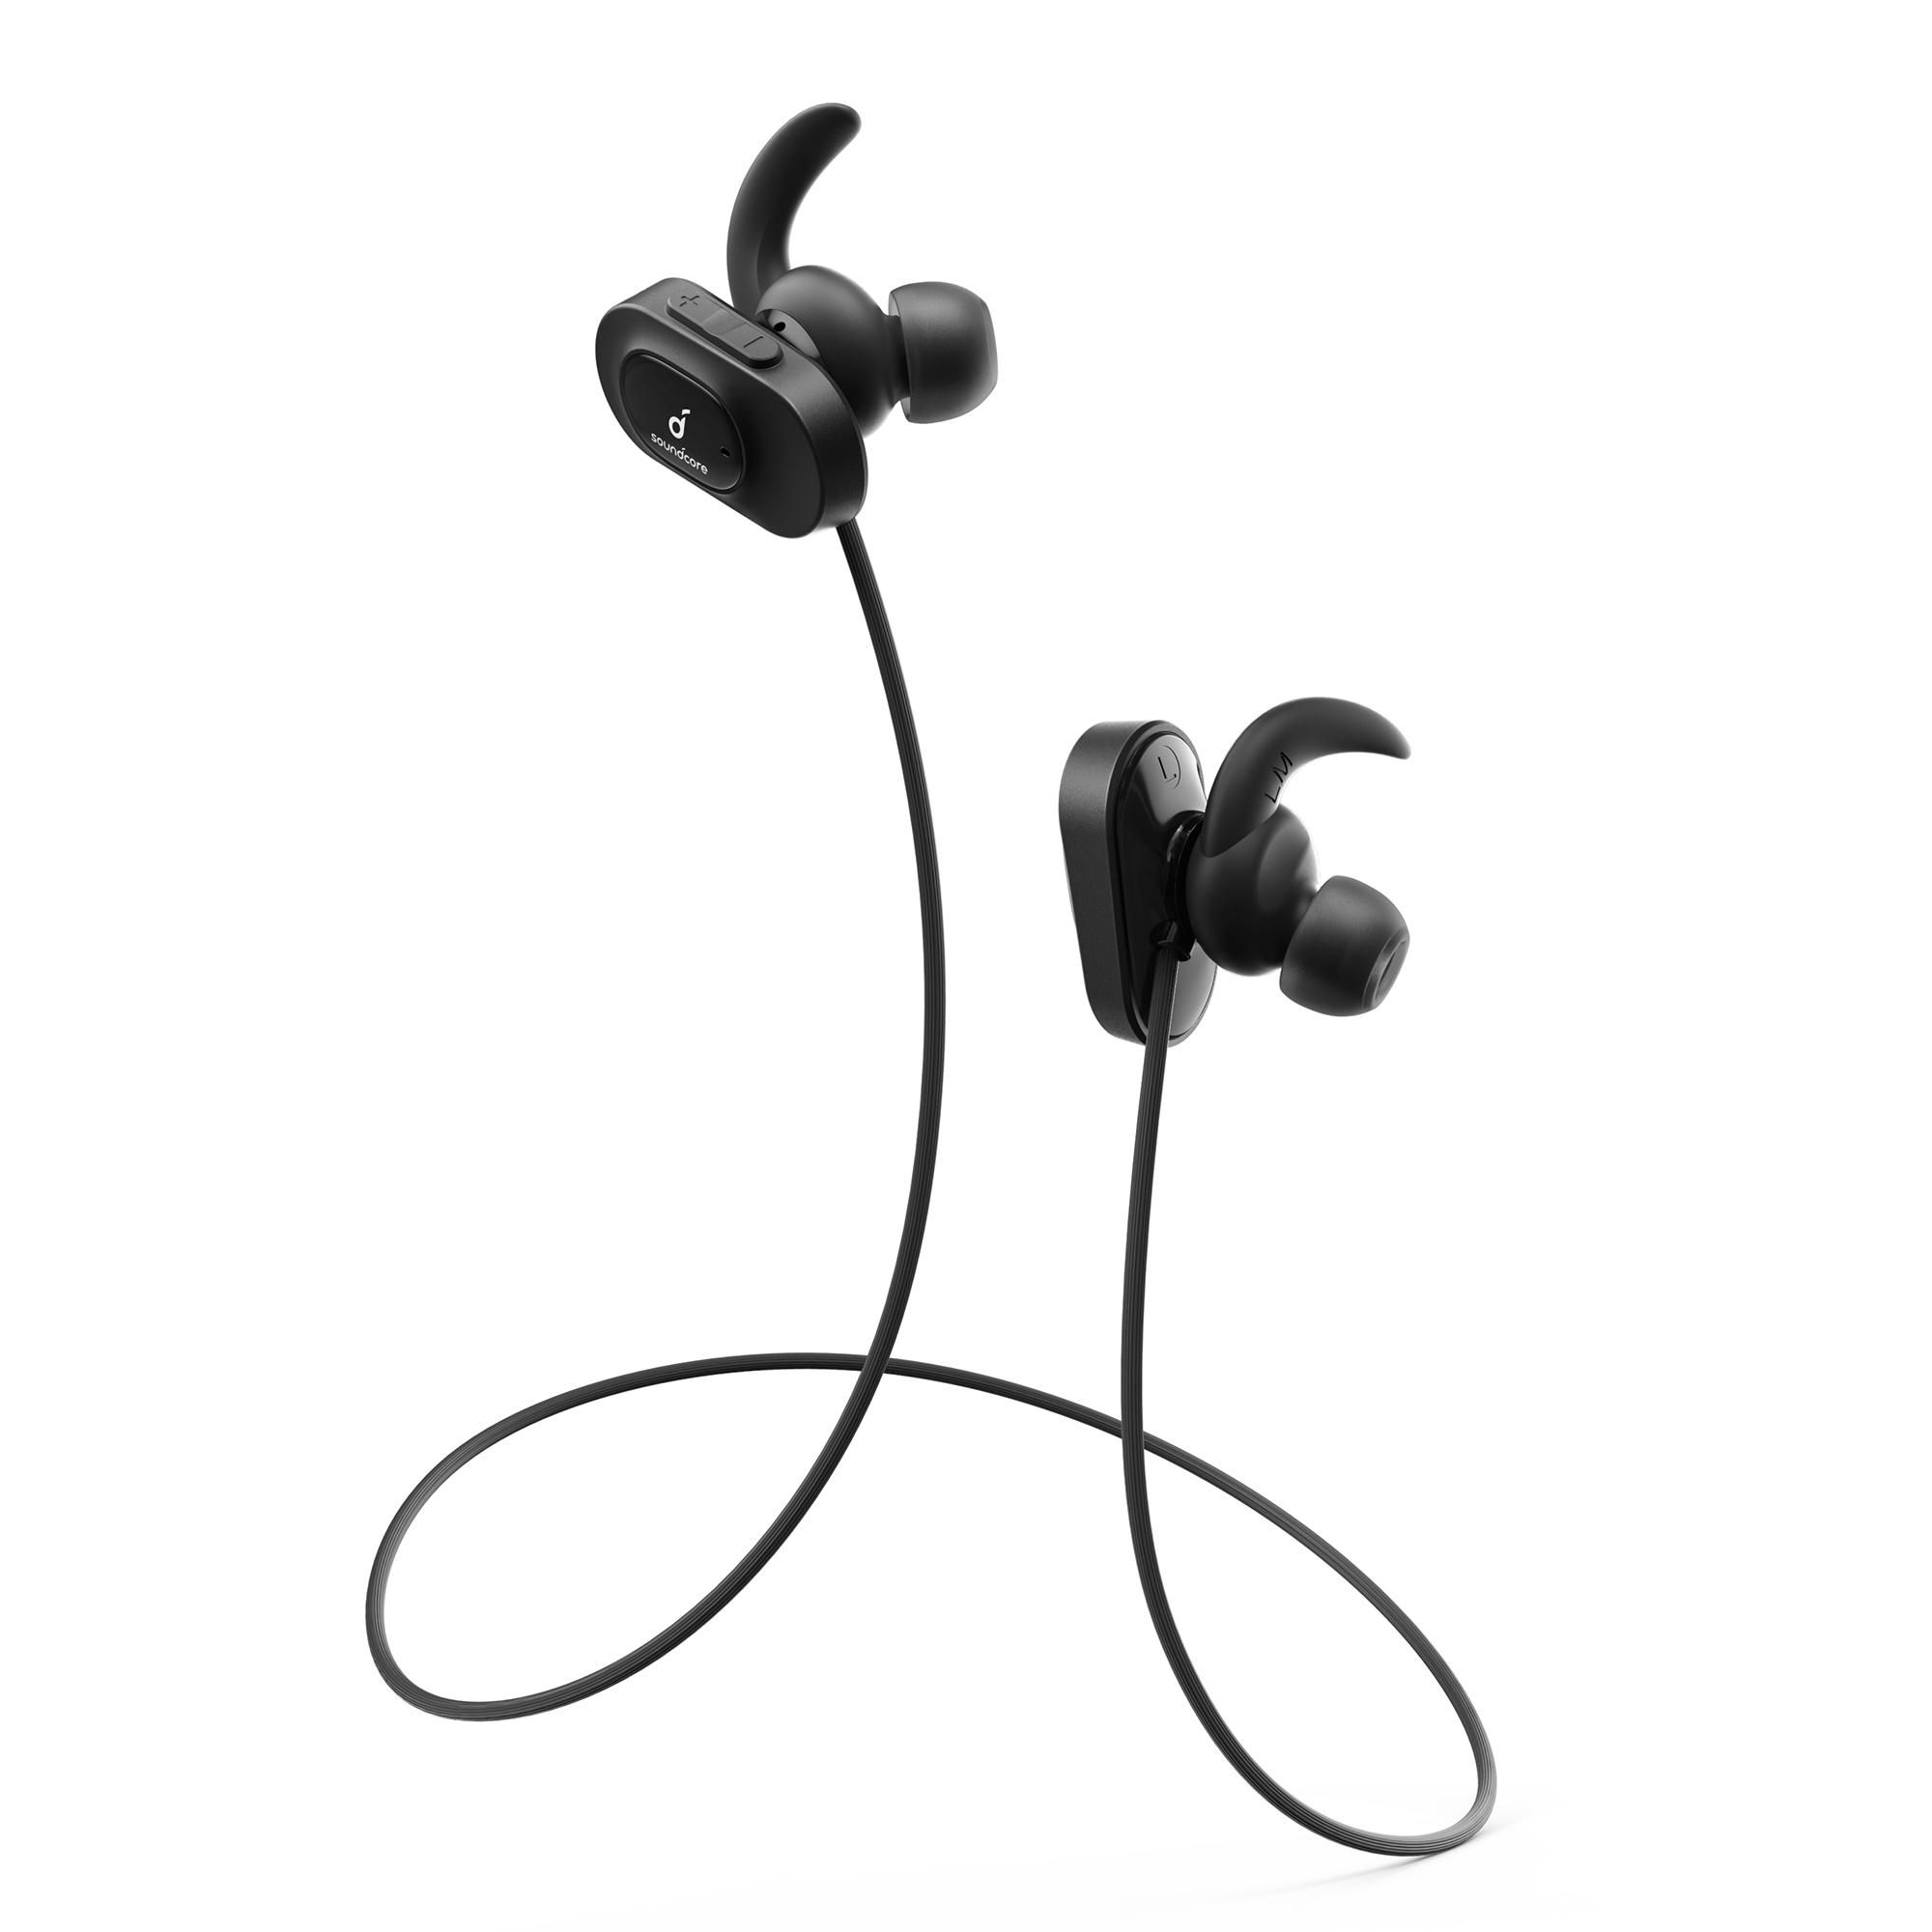 Anker Soundcore Sport Air in-ear bluetooth headphones - Reg $29, Clearance $7 - YMMV